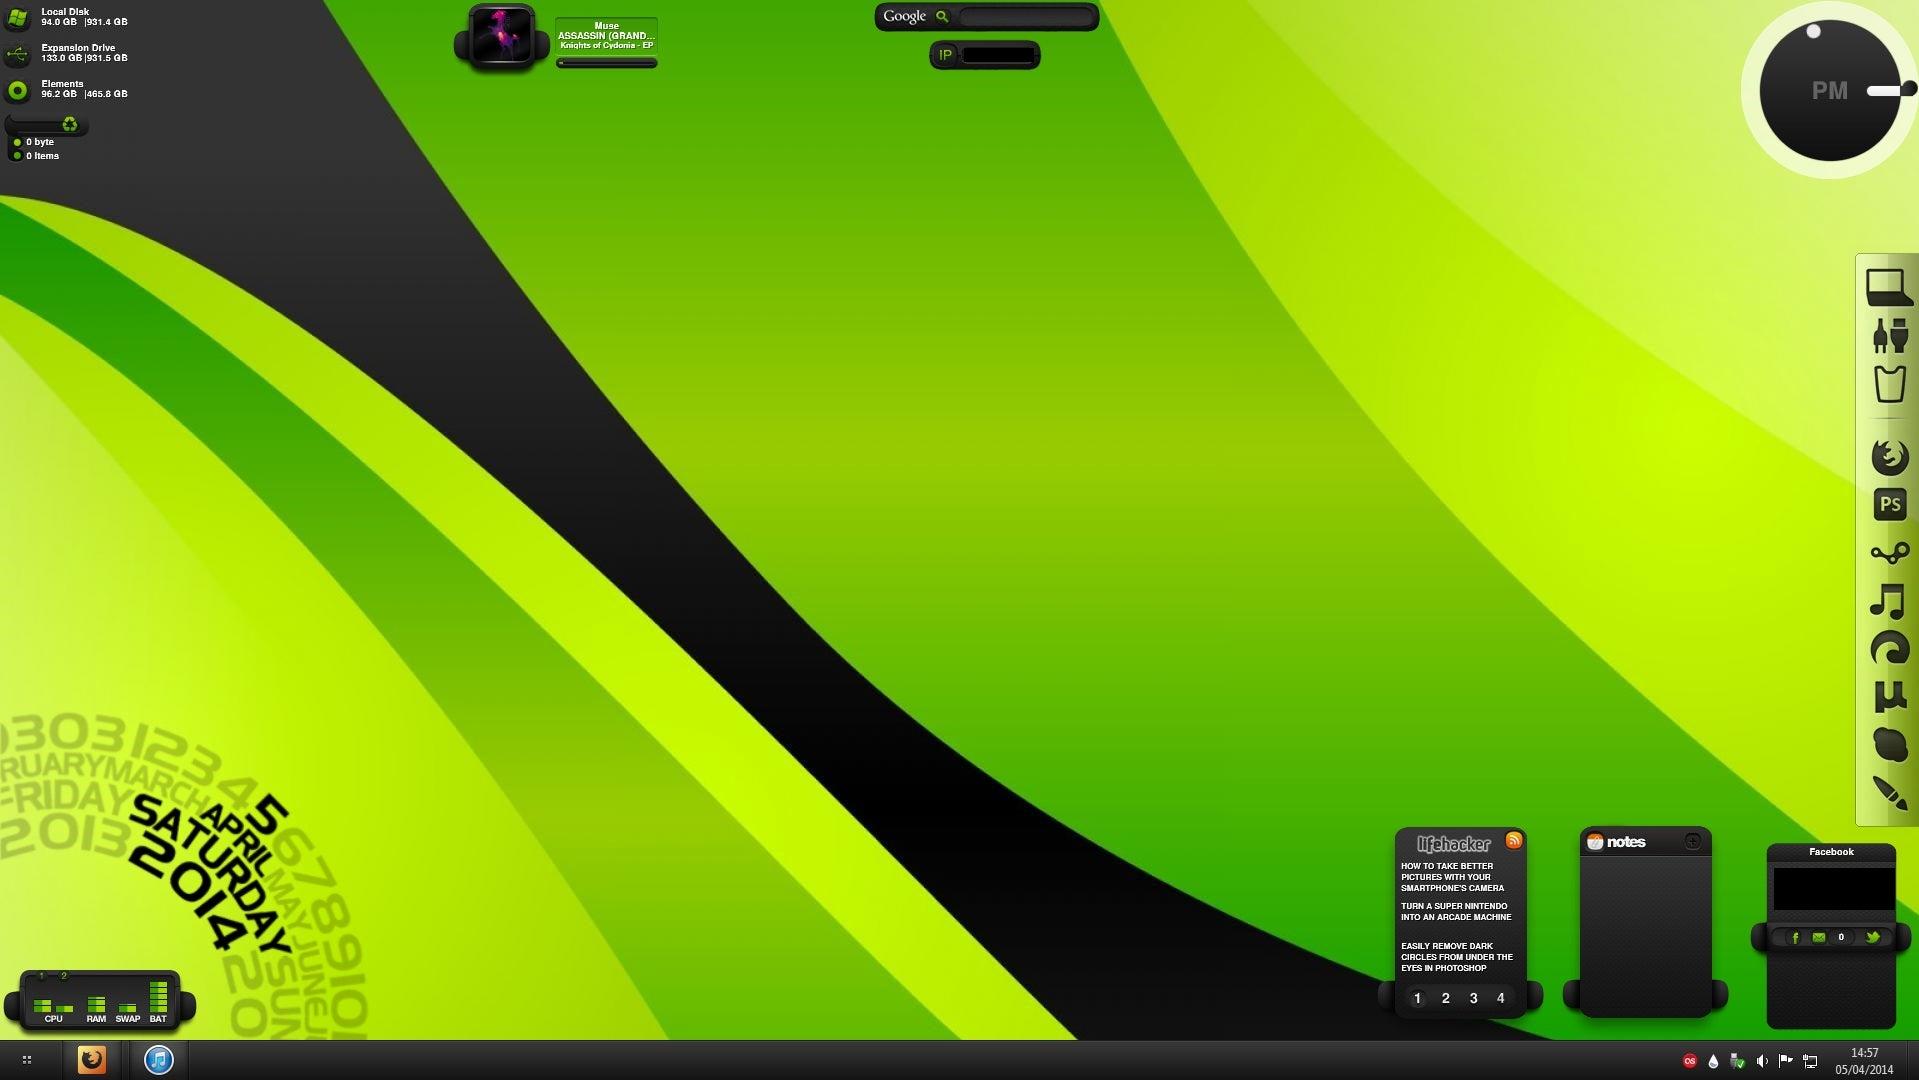 The Green Bubble Windows Desktop